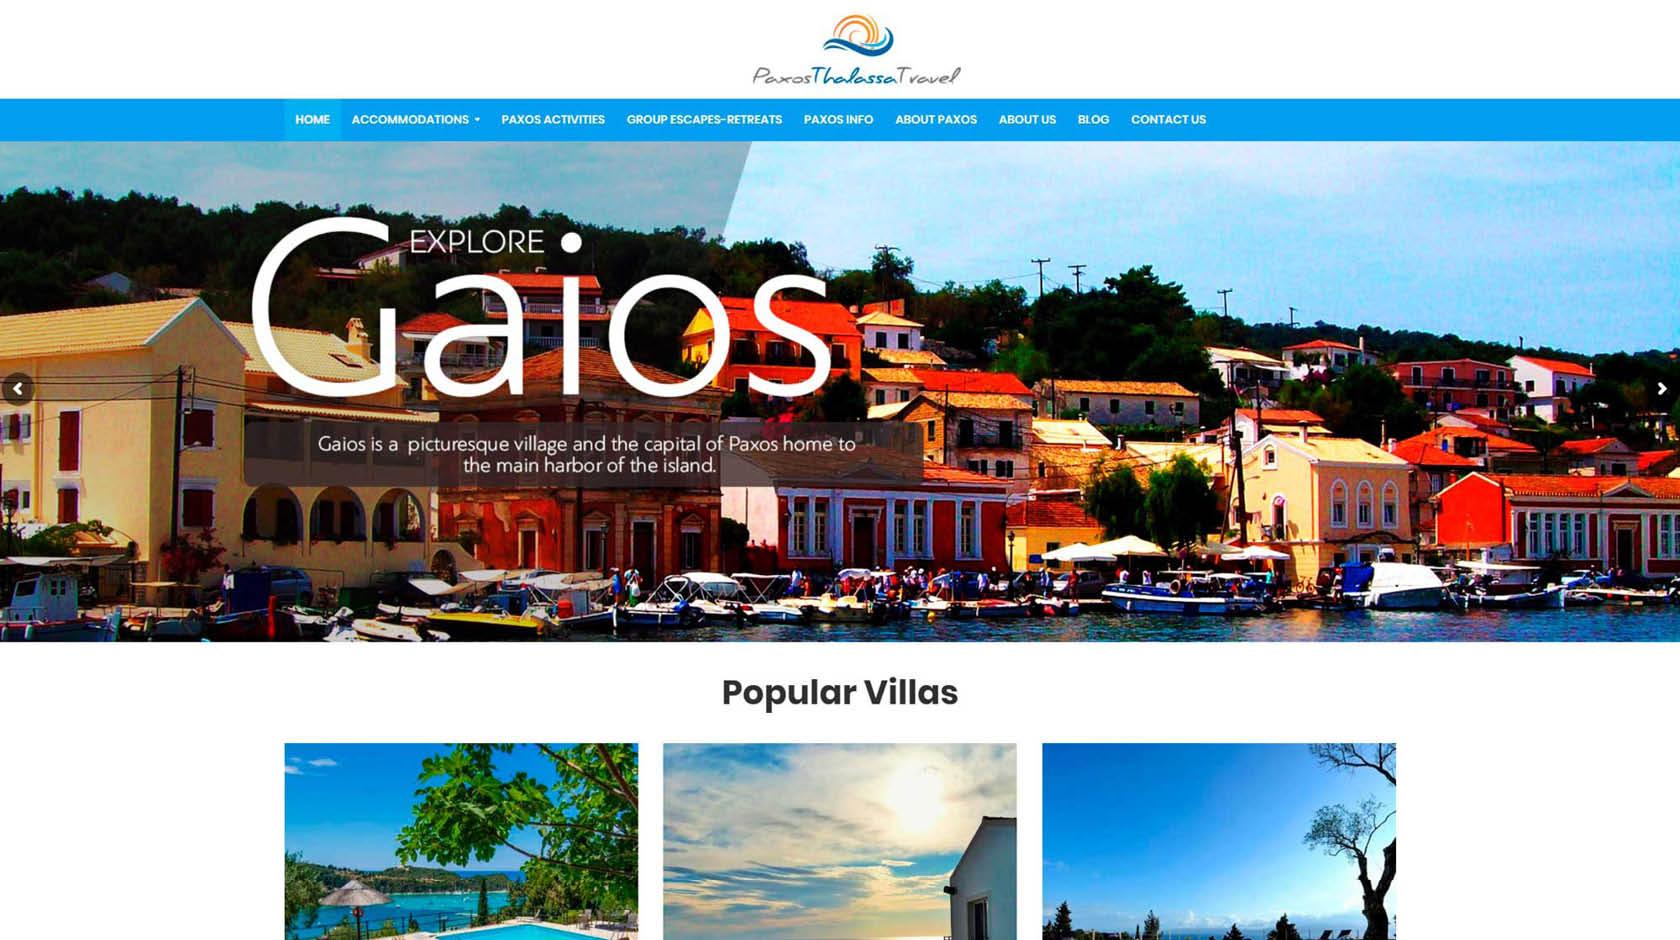 Paxos Thalassa Travel